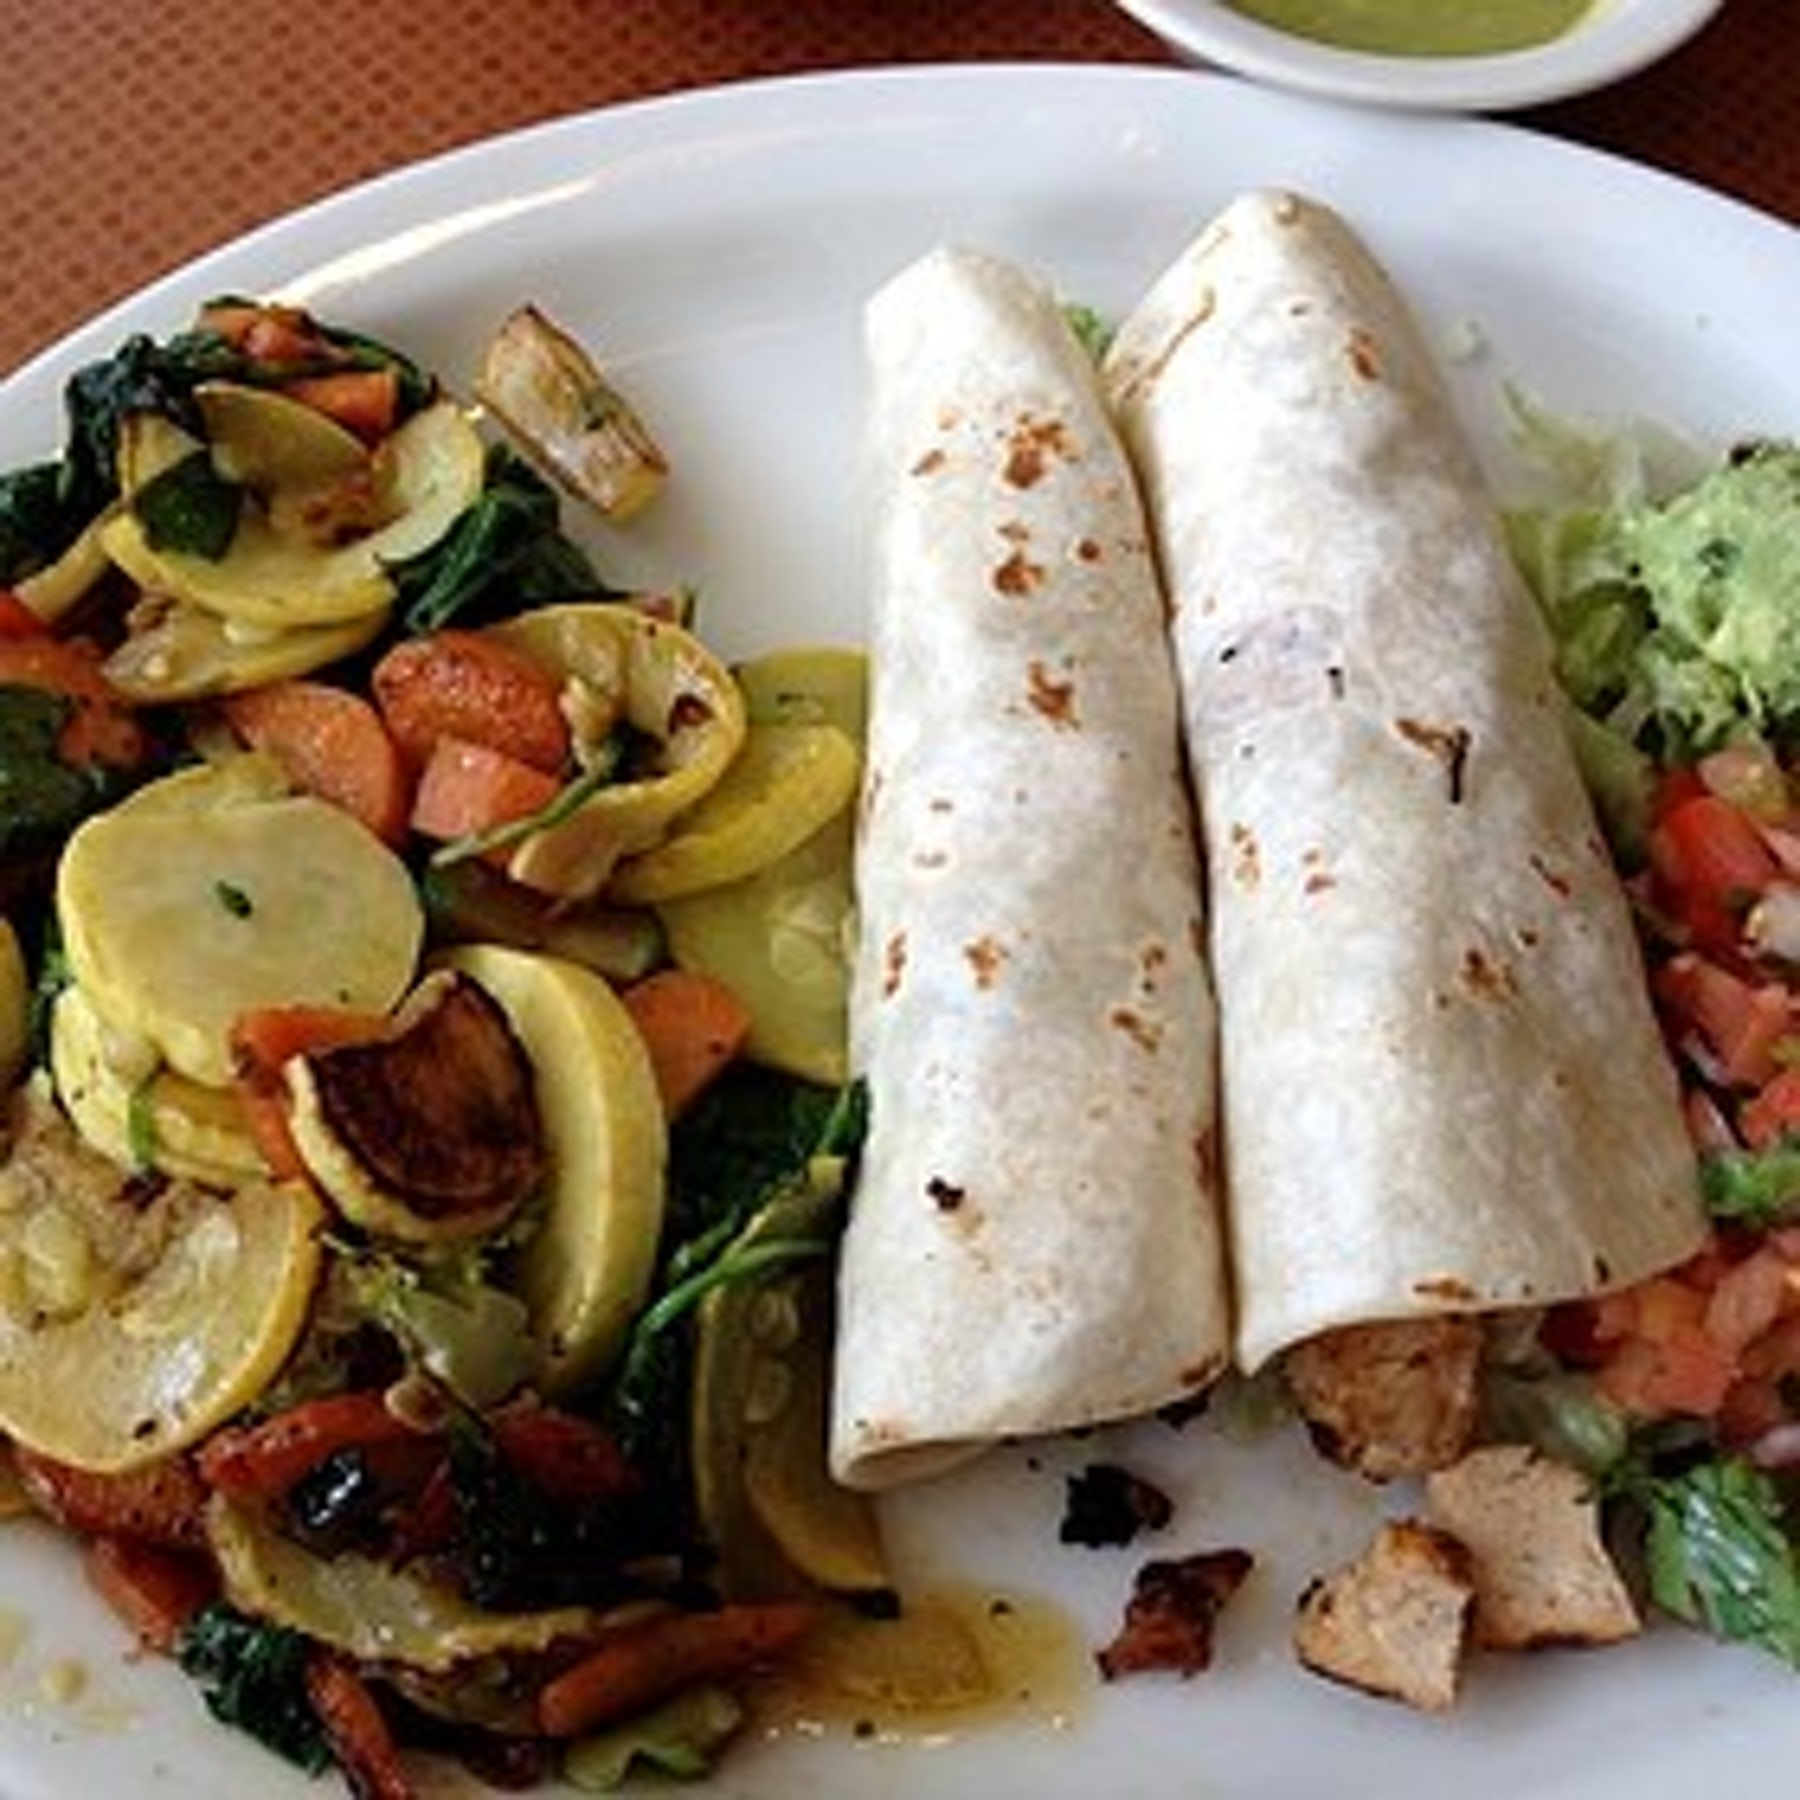 Mario's Mexican & Salvadorian Restaurant in Beyond Dallas